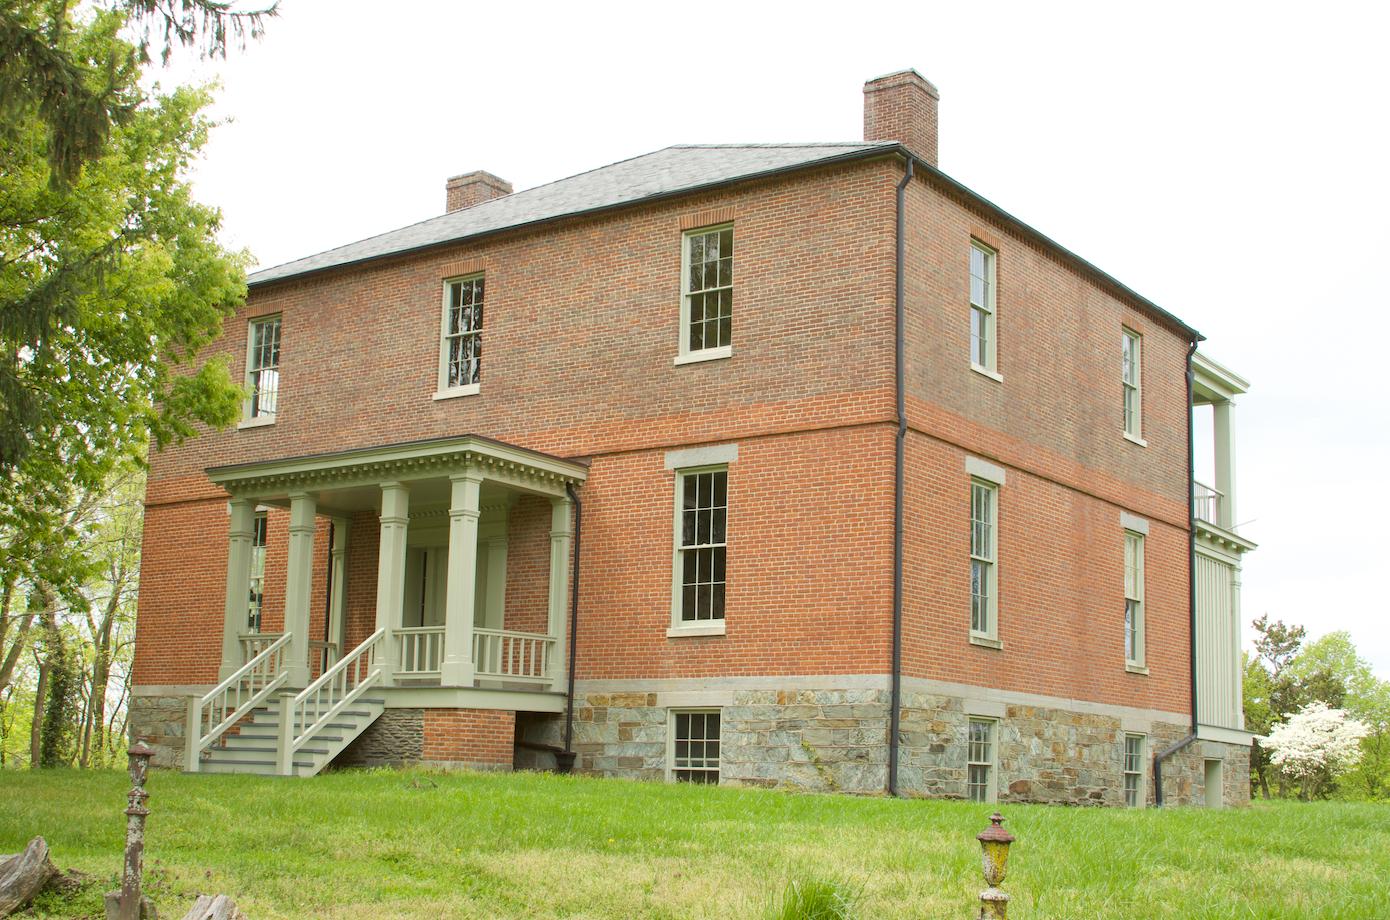 50. Lockwood House front   (Photo by G. Maurice Ballard)